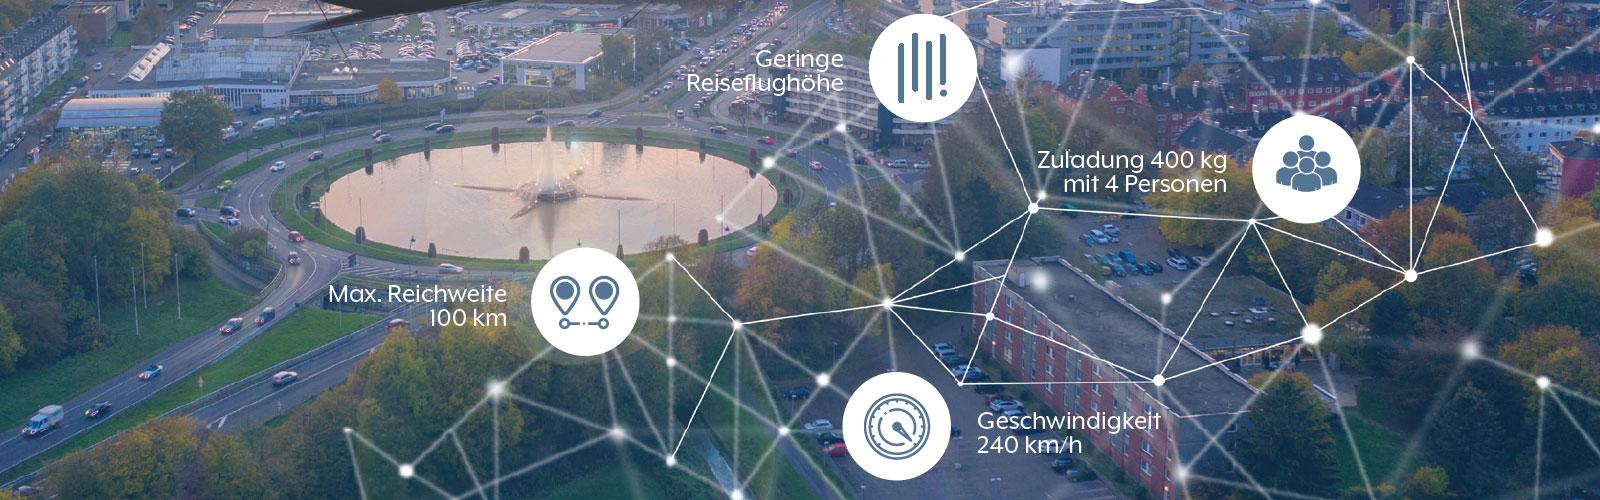 Braunwagner Produkt Mobility Design Consulting Forschungsprojekt SkyCab 2019 2020